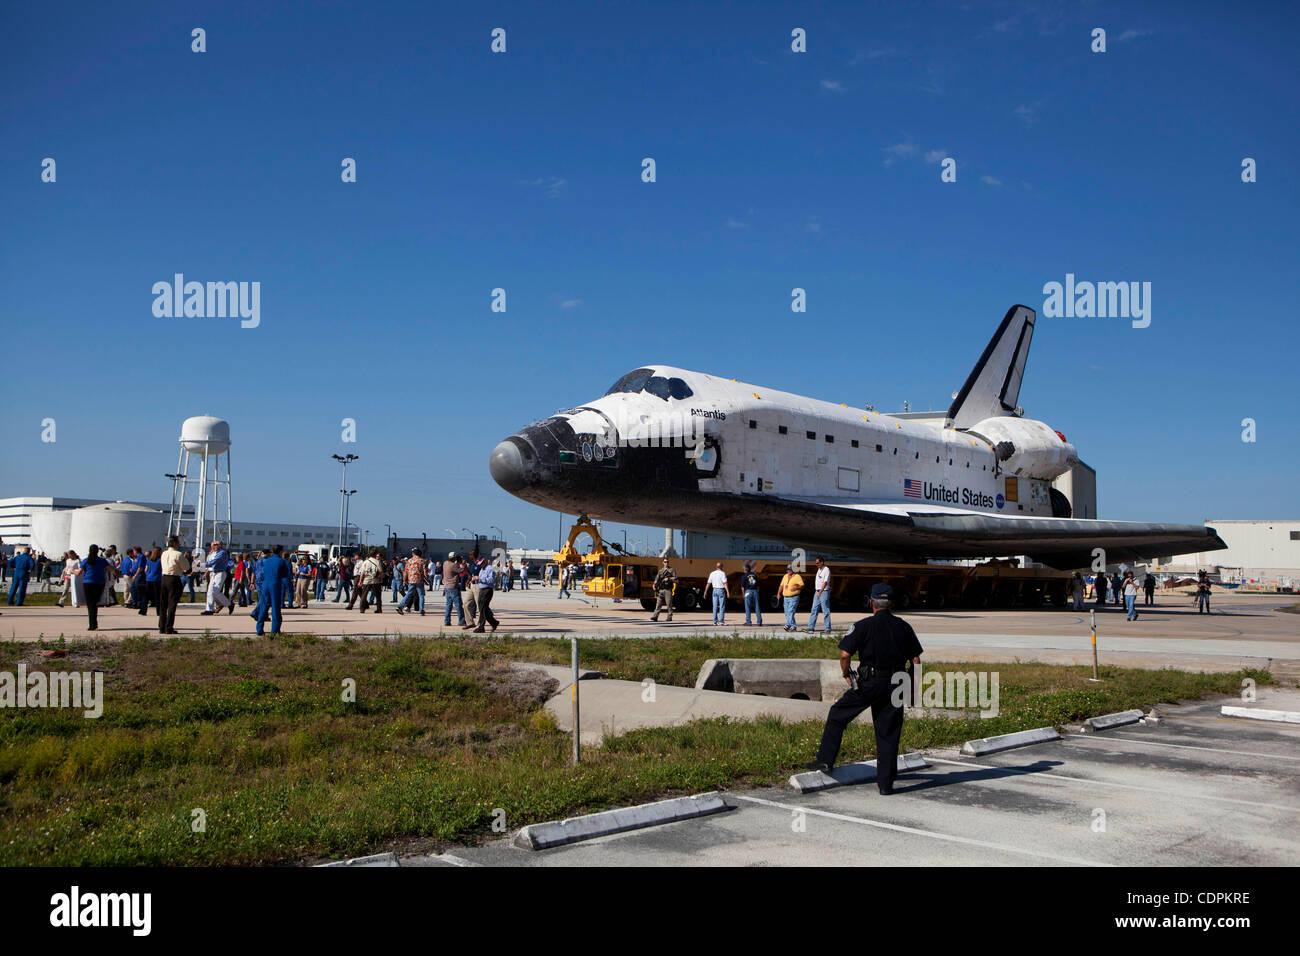 us space shuttle atlantis - photo #19